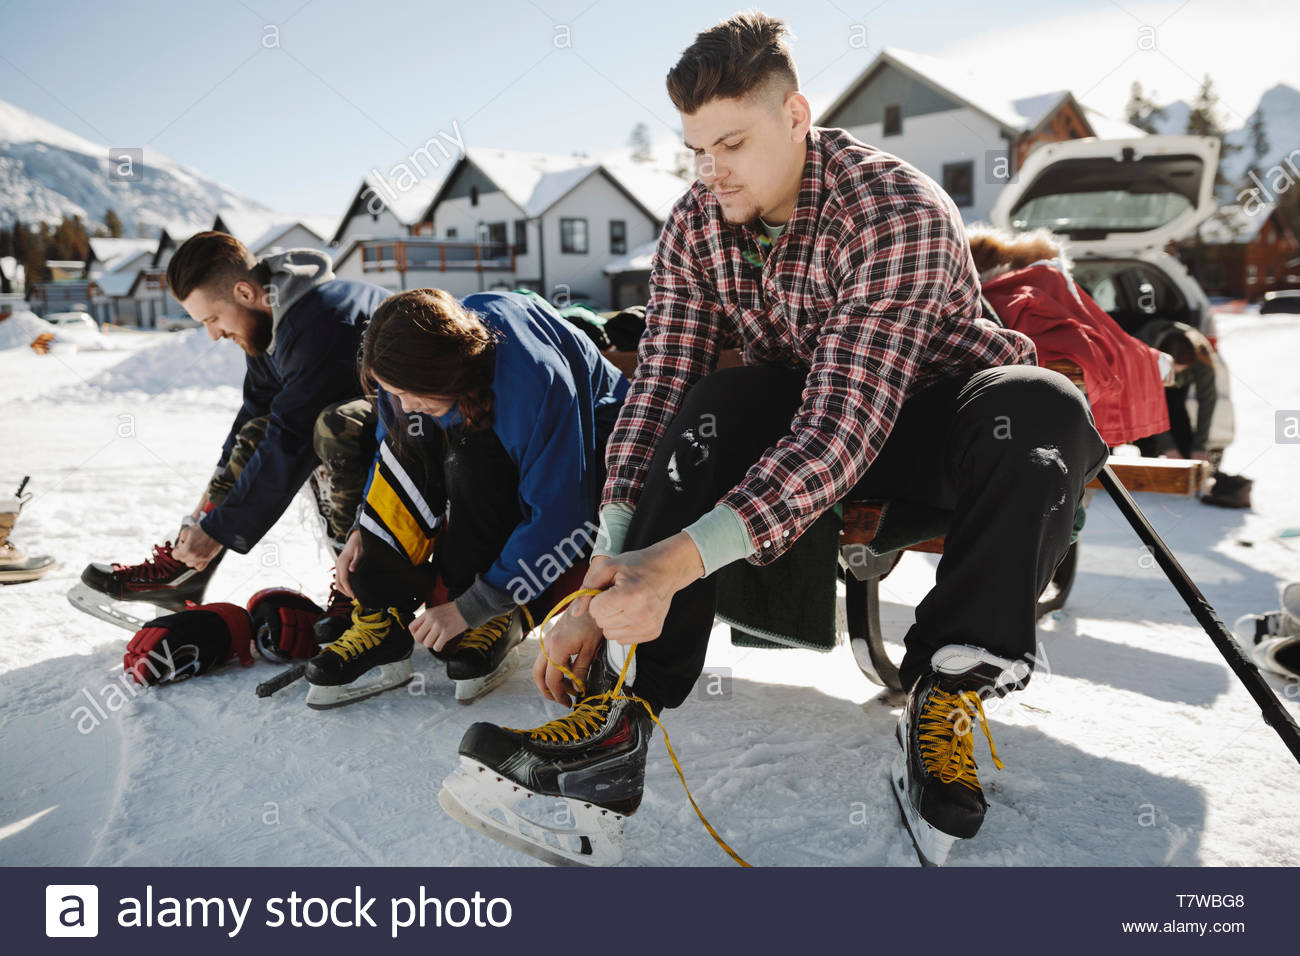 Friends tying ice skates, preparing to play outdoor ice hockey - Stock Image